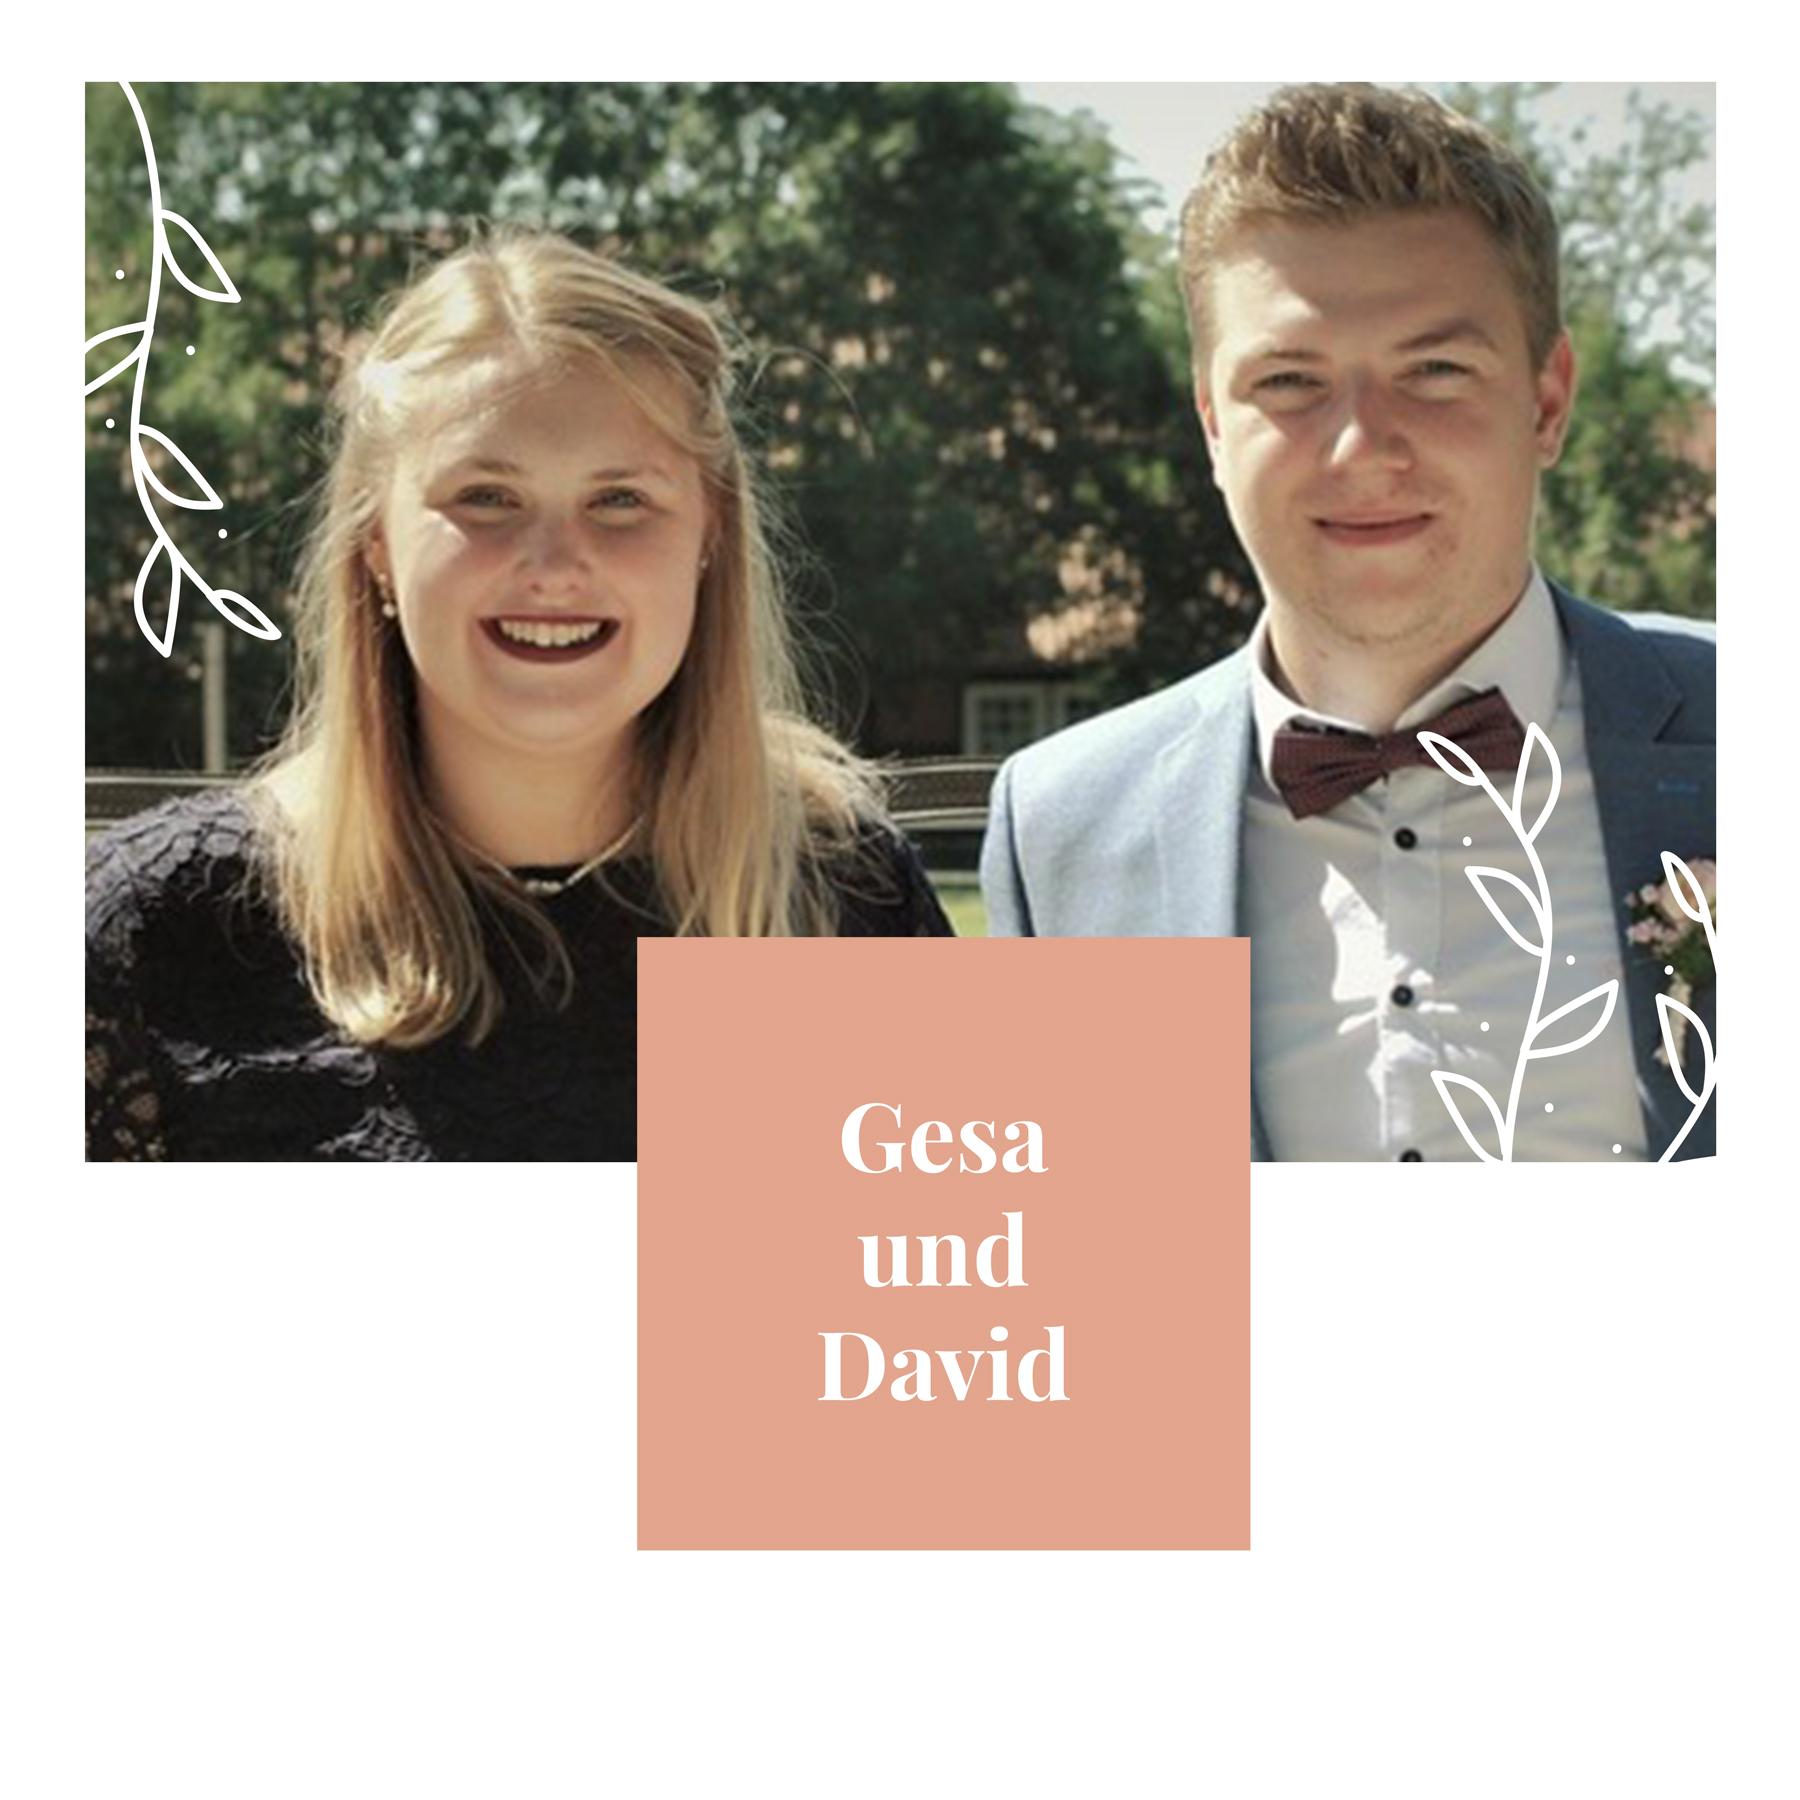 GESA & DAVID